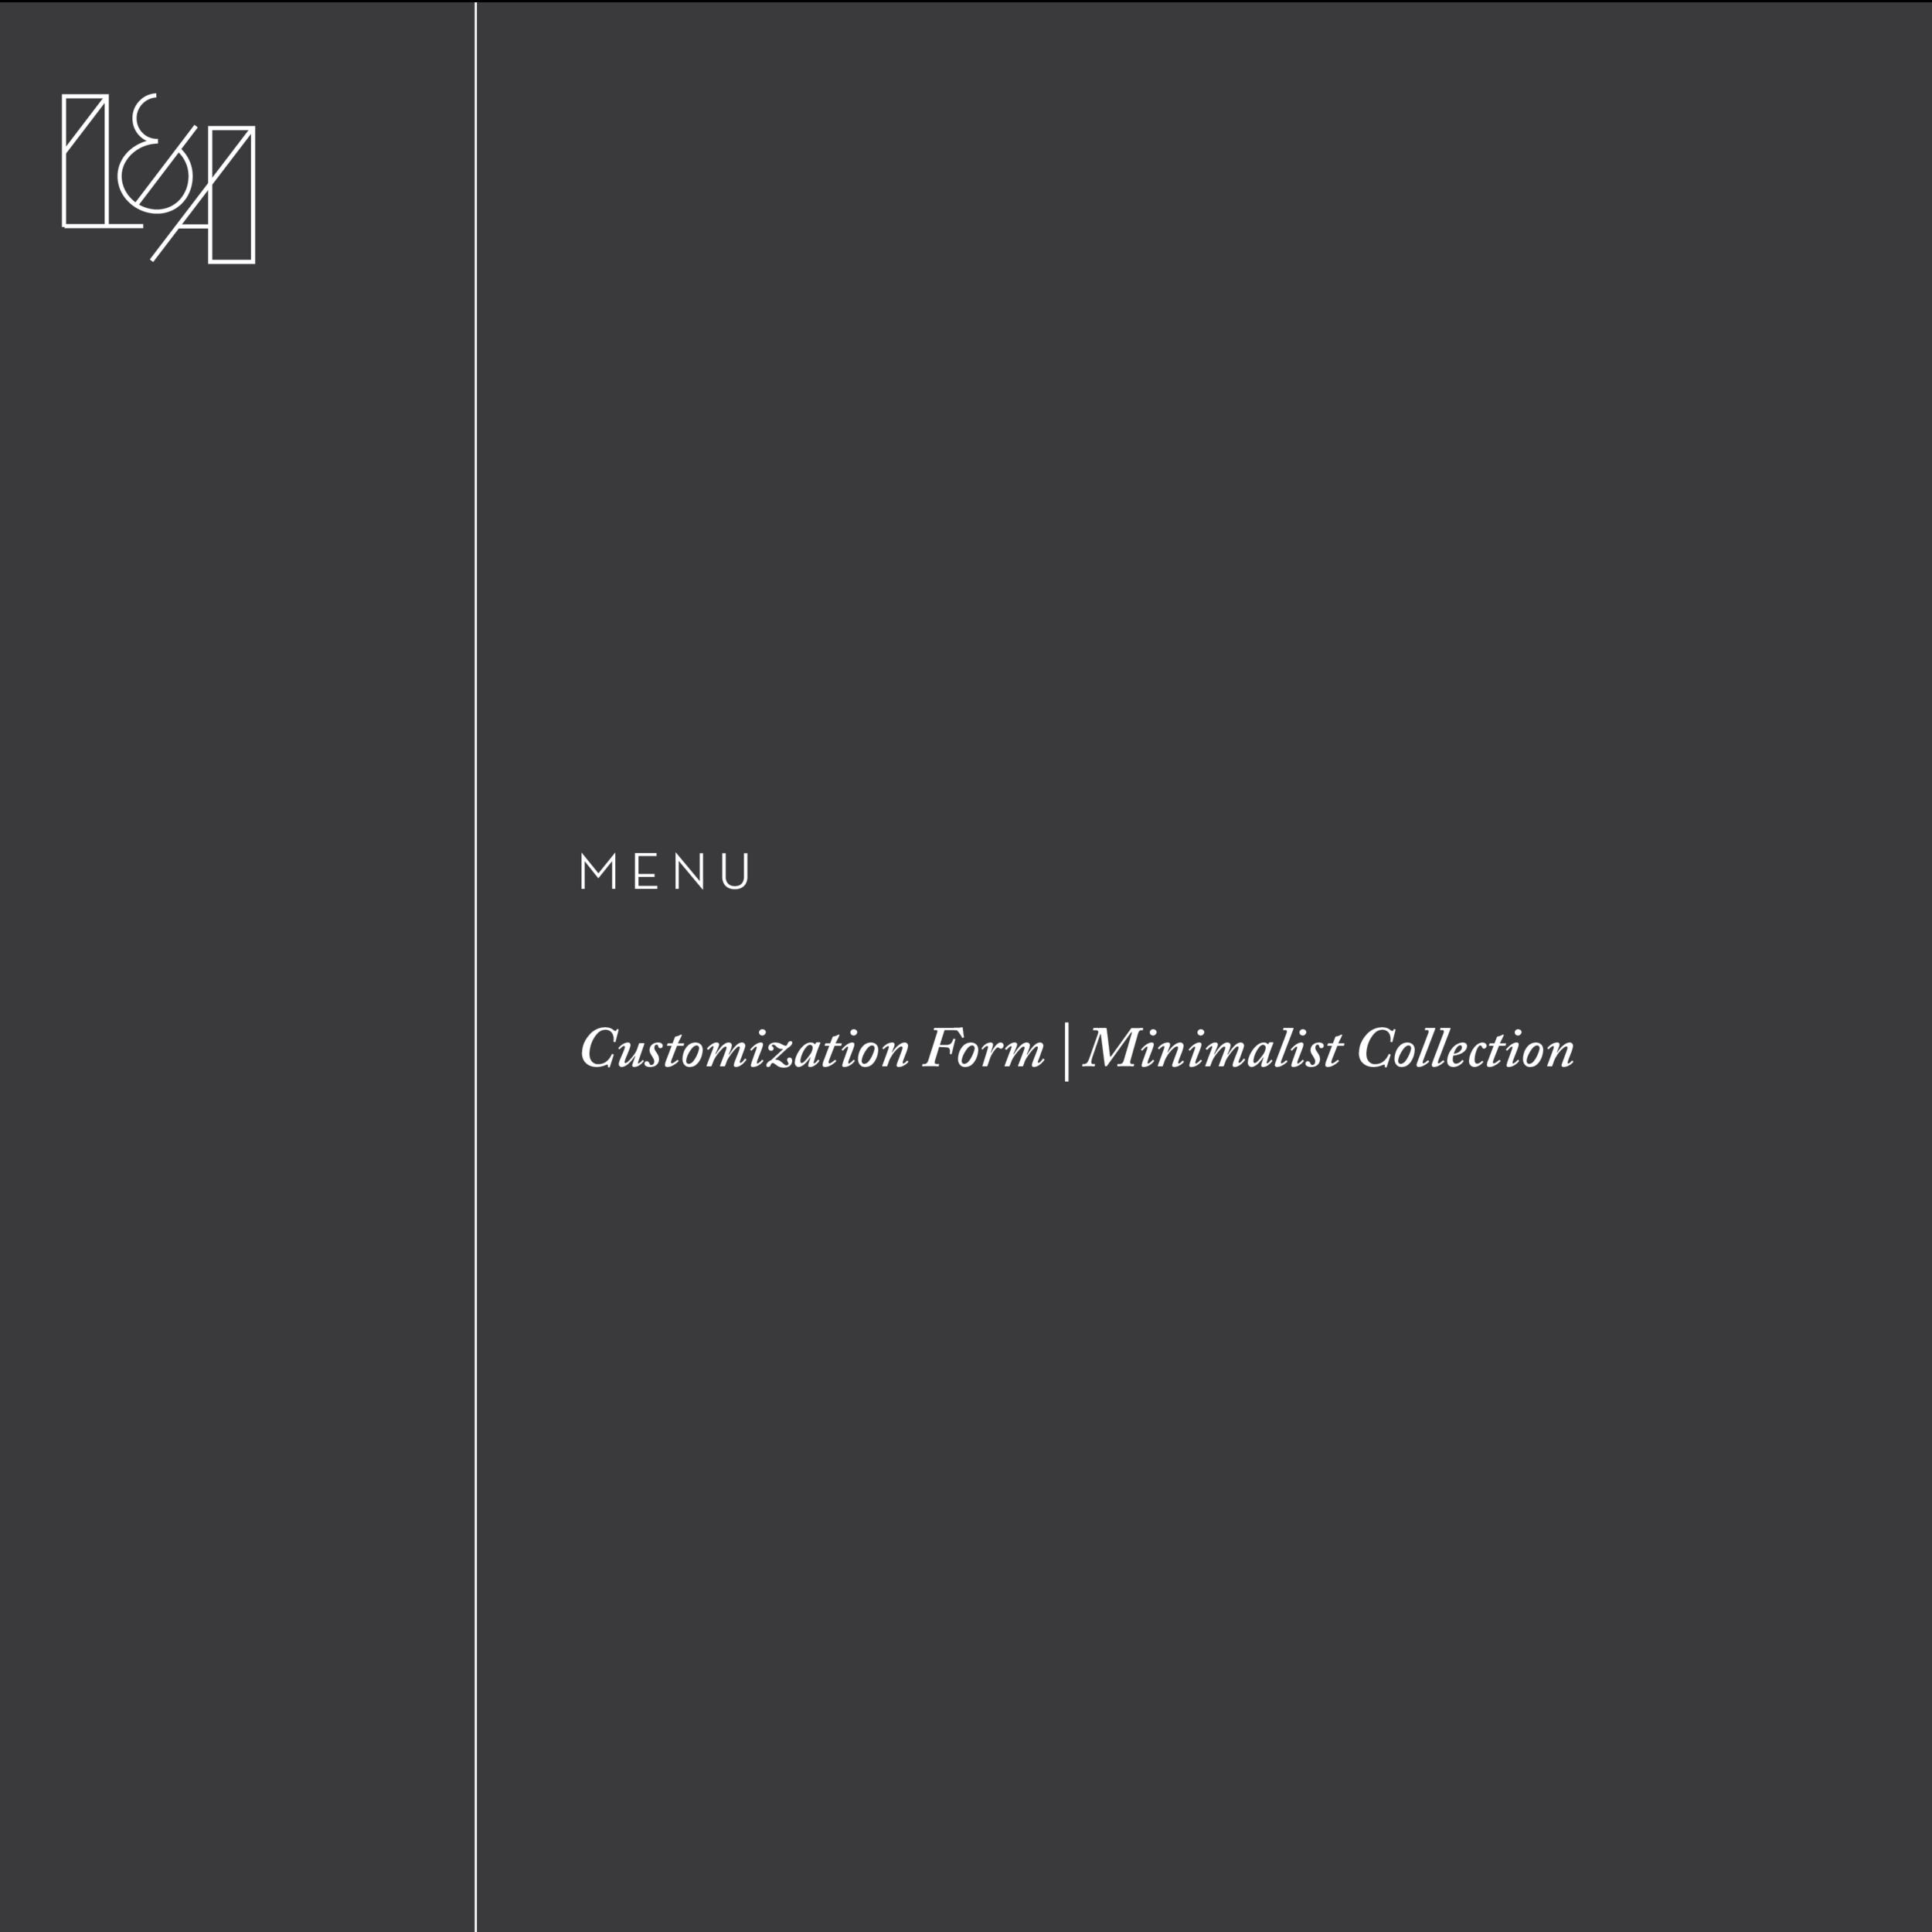 menu customiation intro-01.png